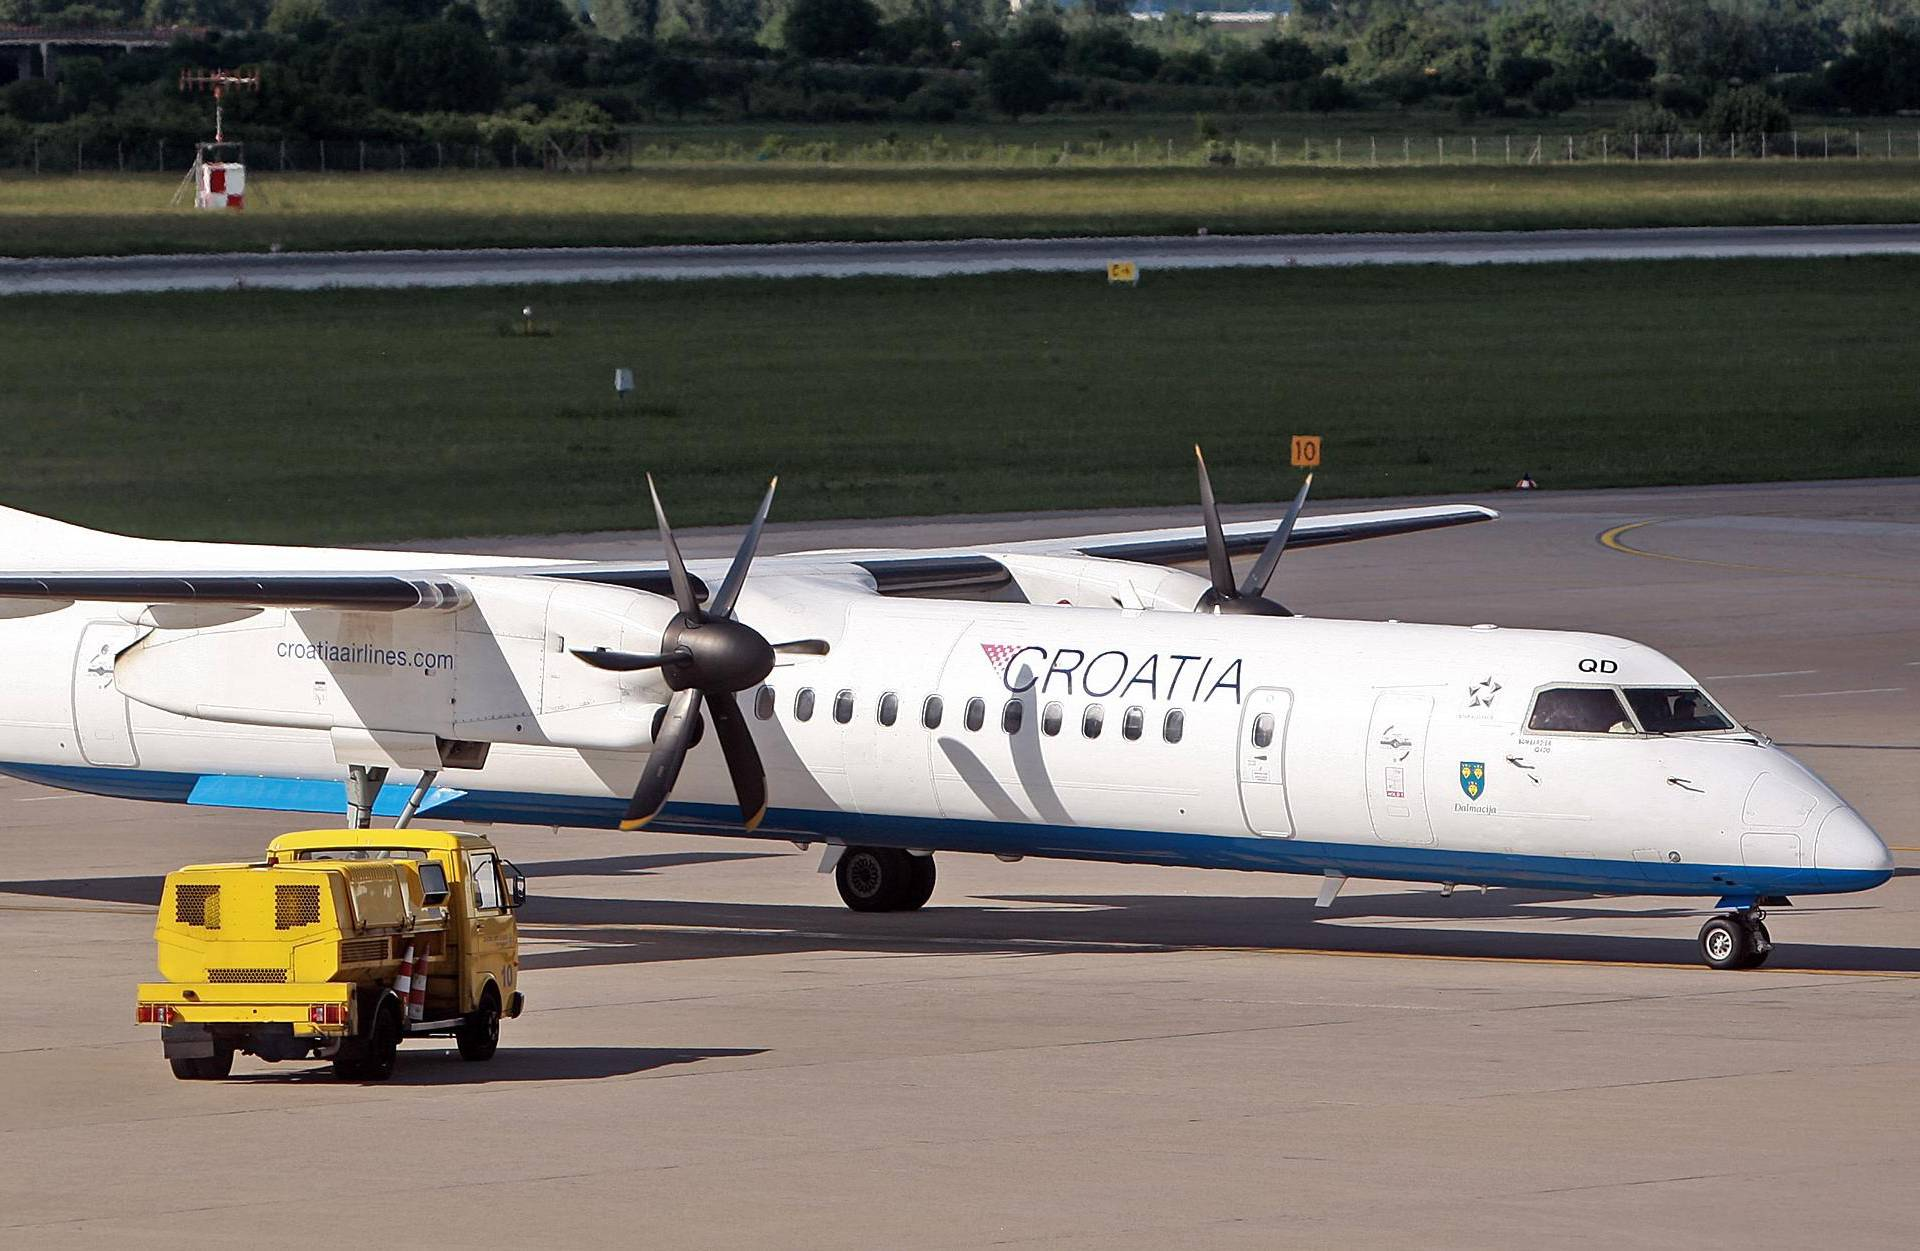 Novi slučaj: Ospice je dobila stjuardesa Croatia Airlinesa